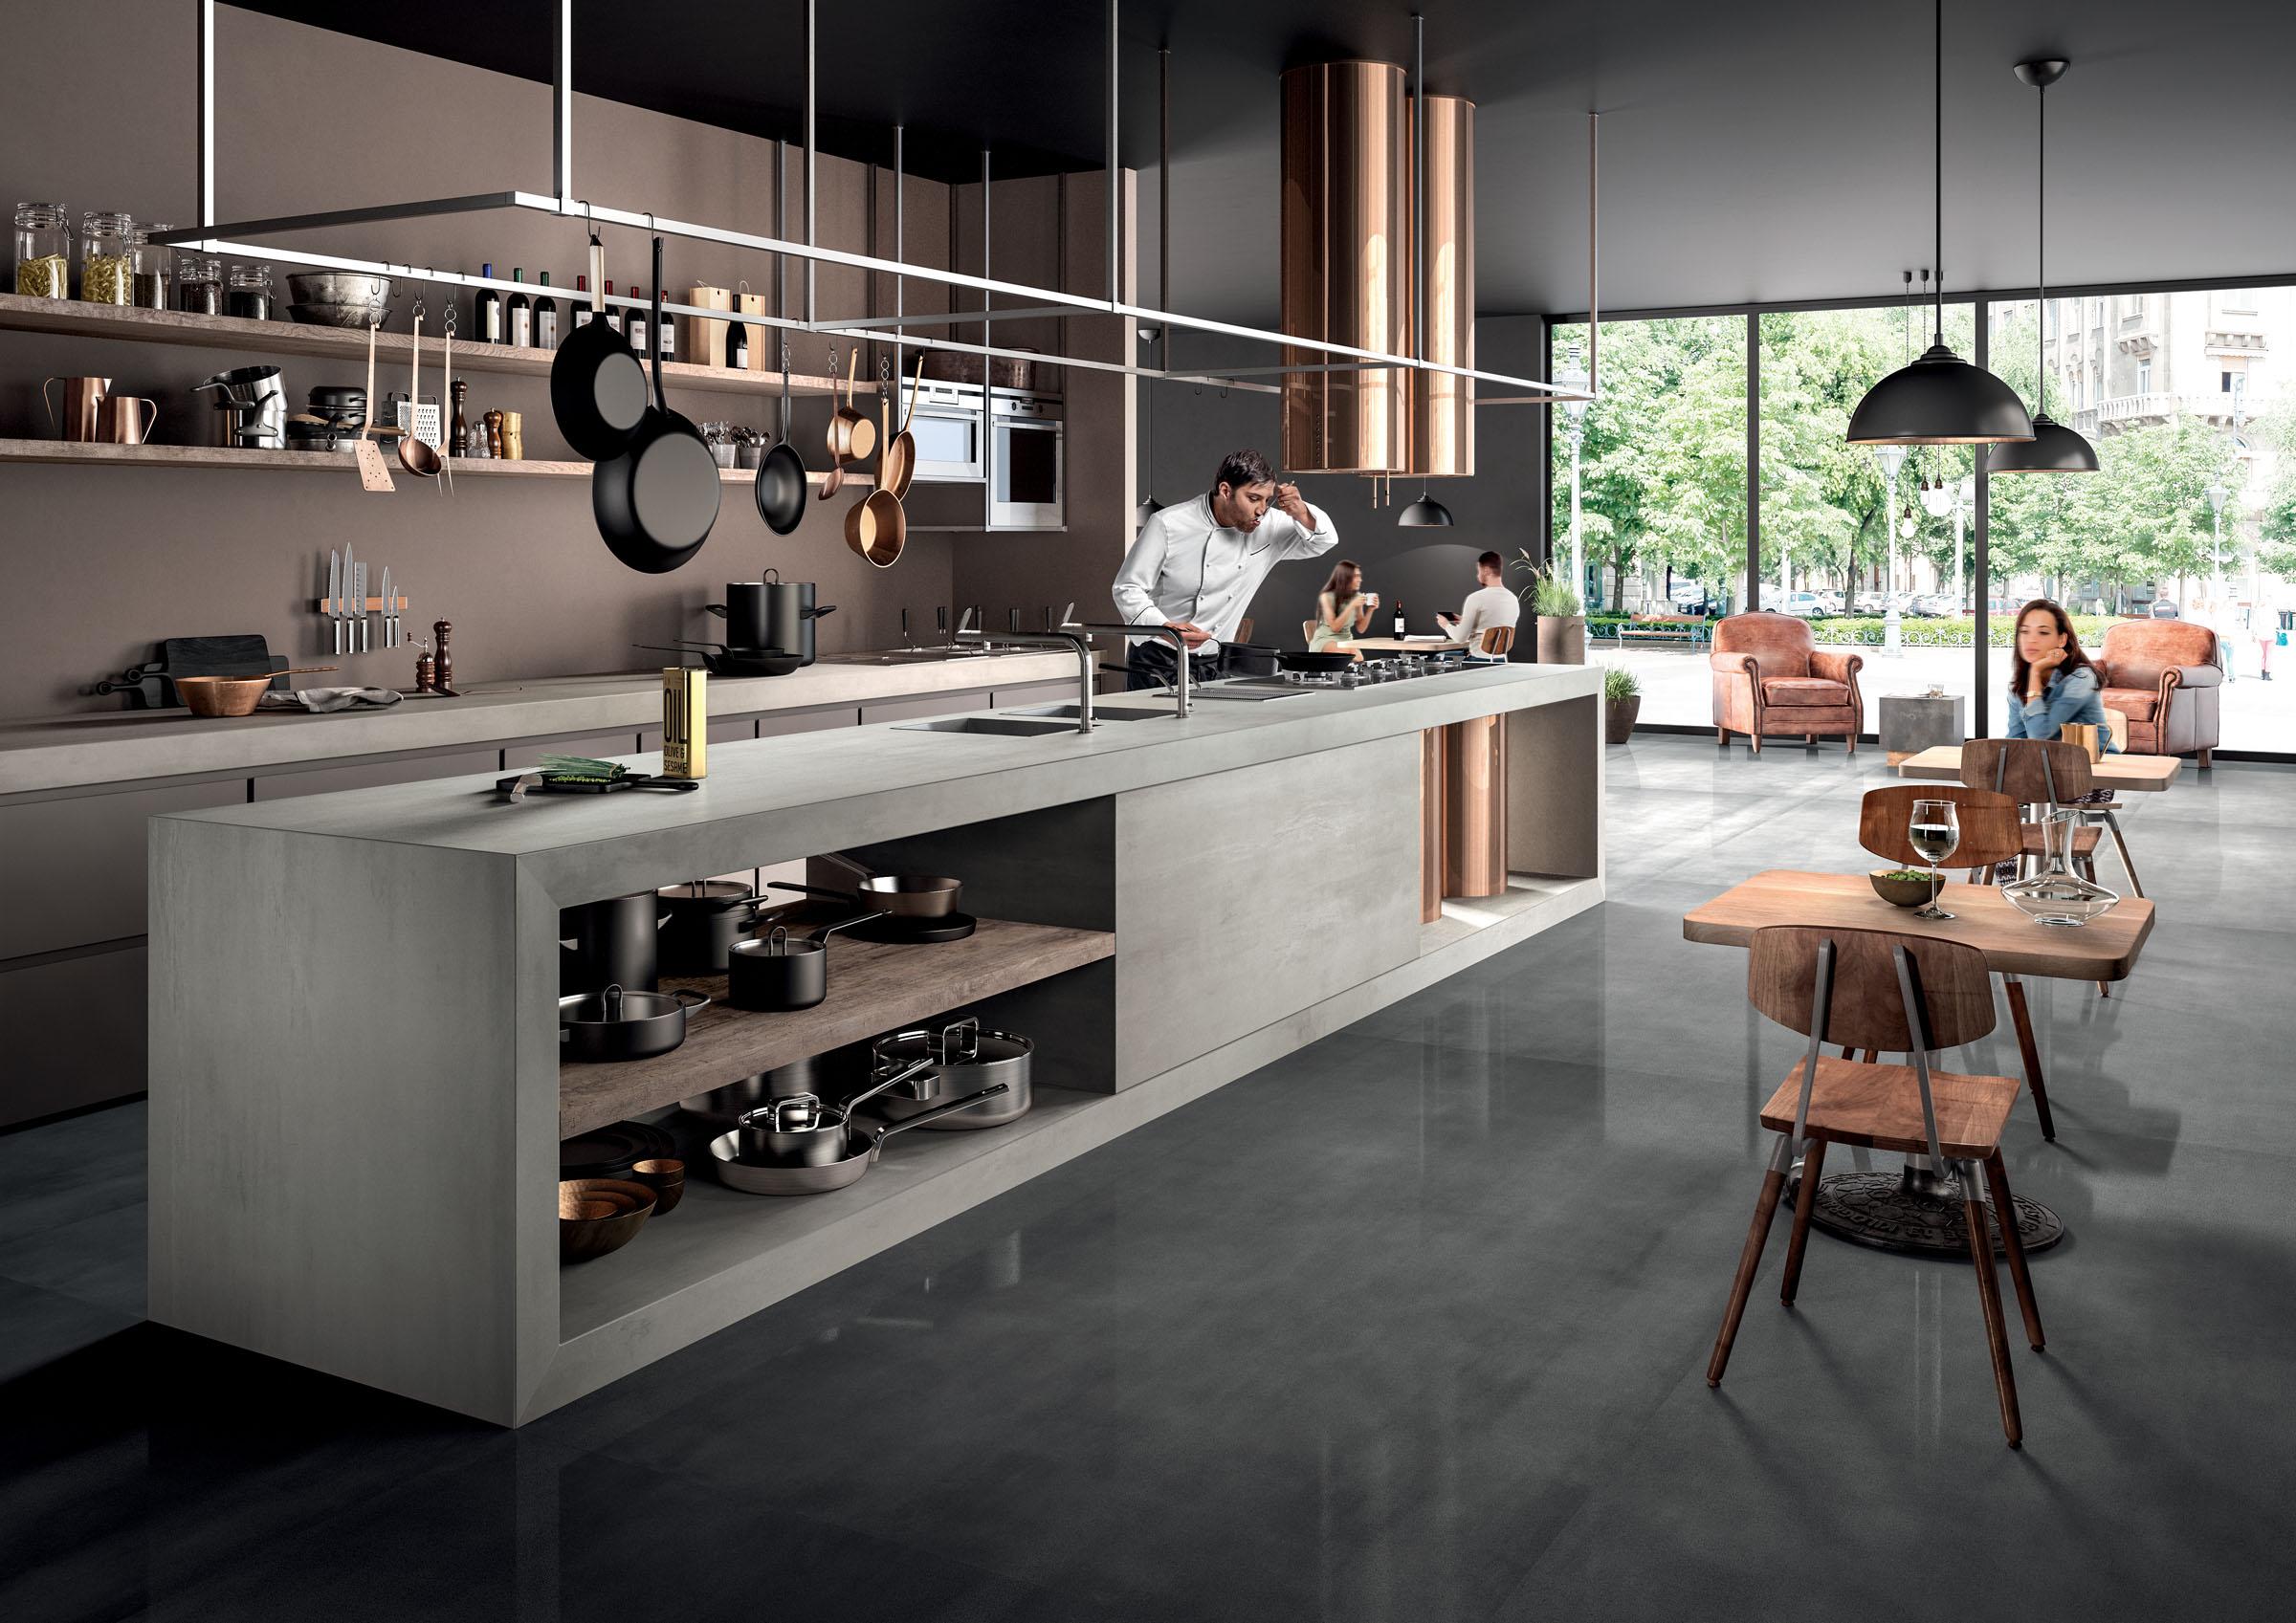 Schön Küche Ausstellungsräume Newton Abbot Fotos - Küche Set Ideen ...